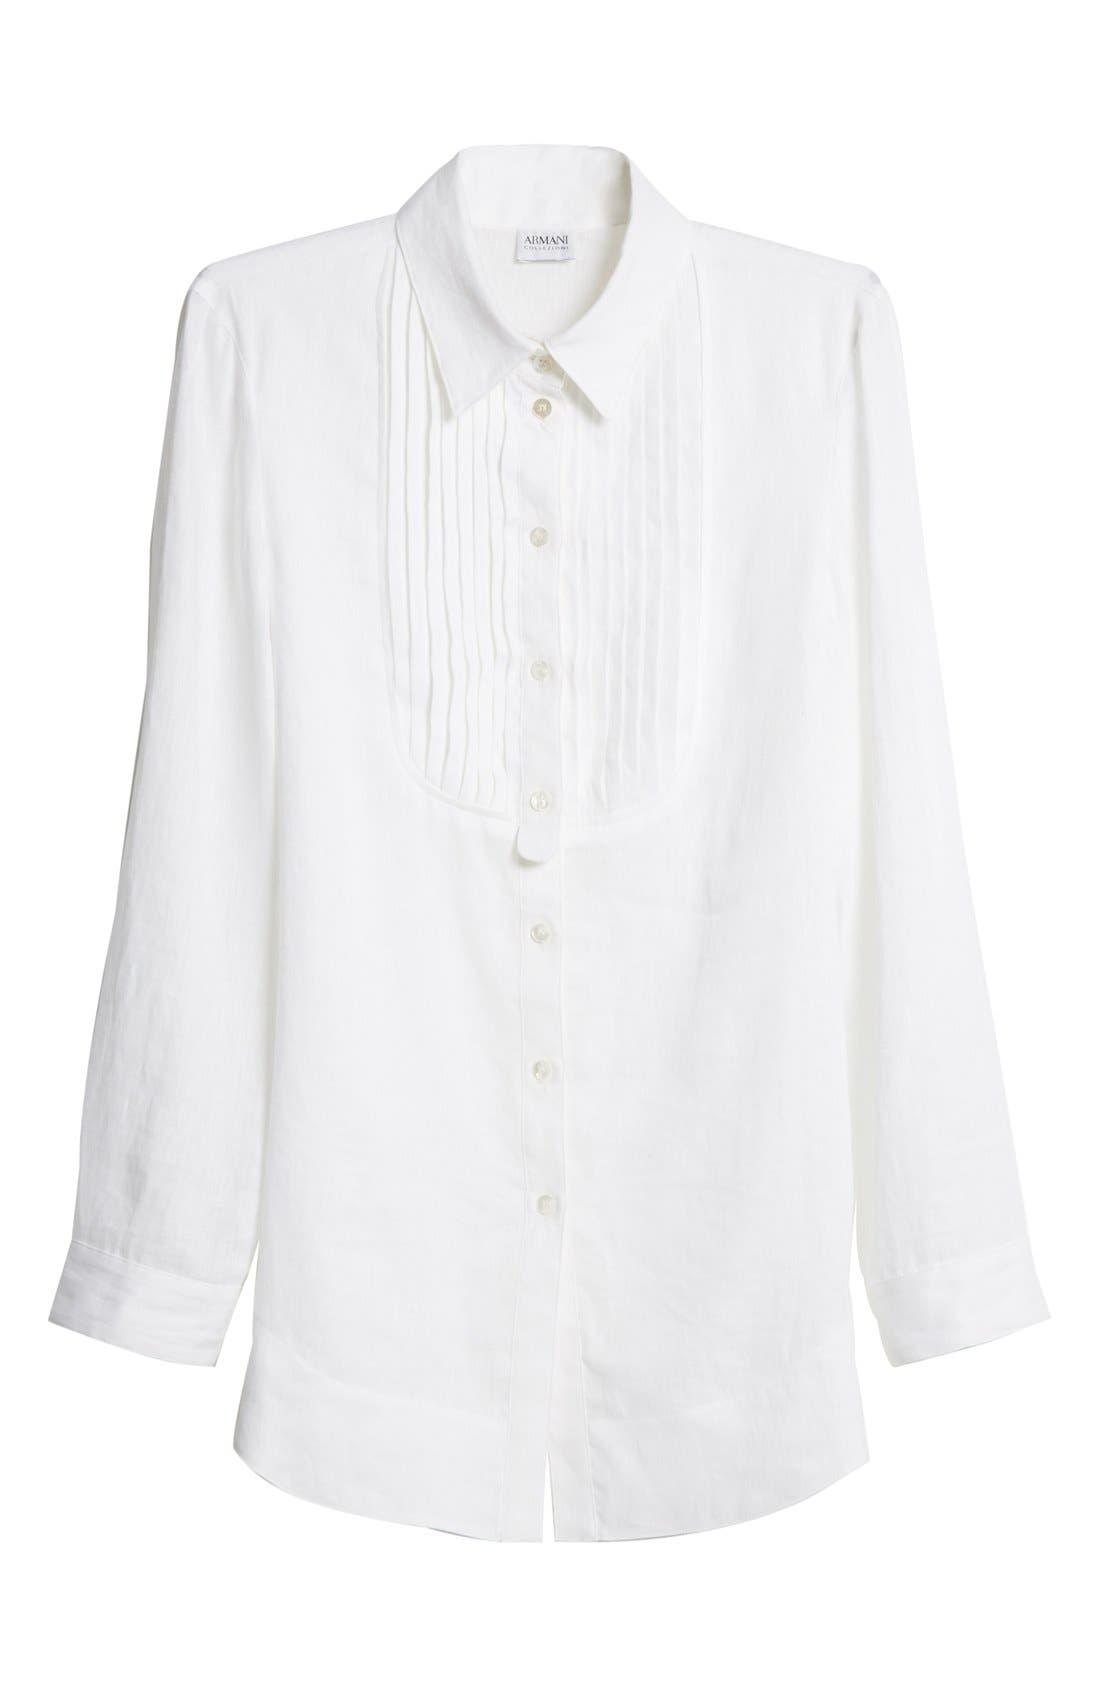 ARMANI COLLEZIONI,                             Linen Tuxedo Shirt,                             Alternate thumbnail 5, color,                             100